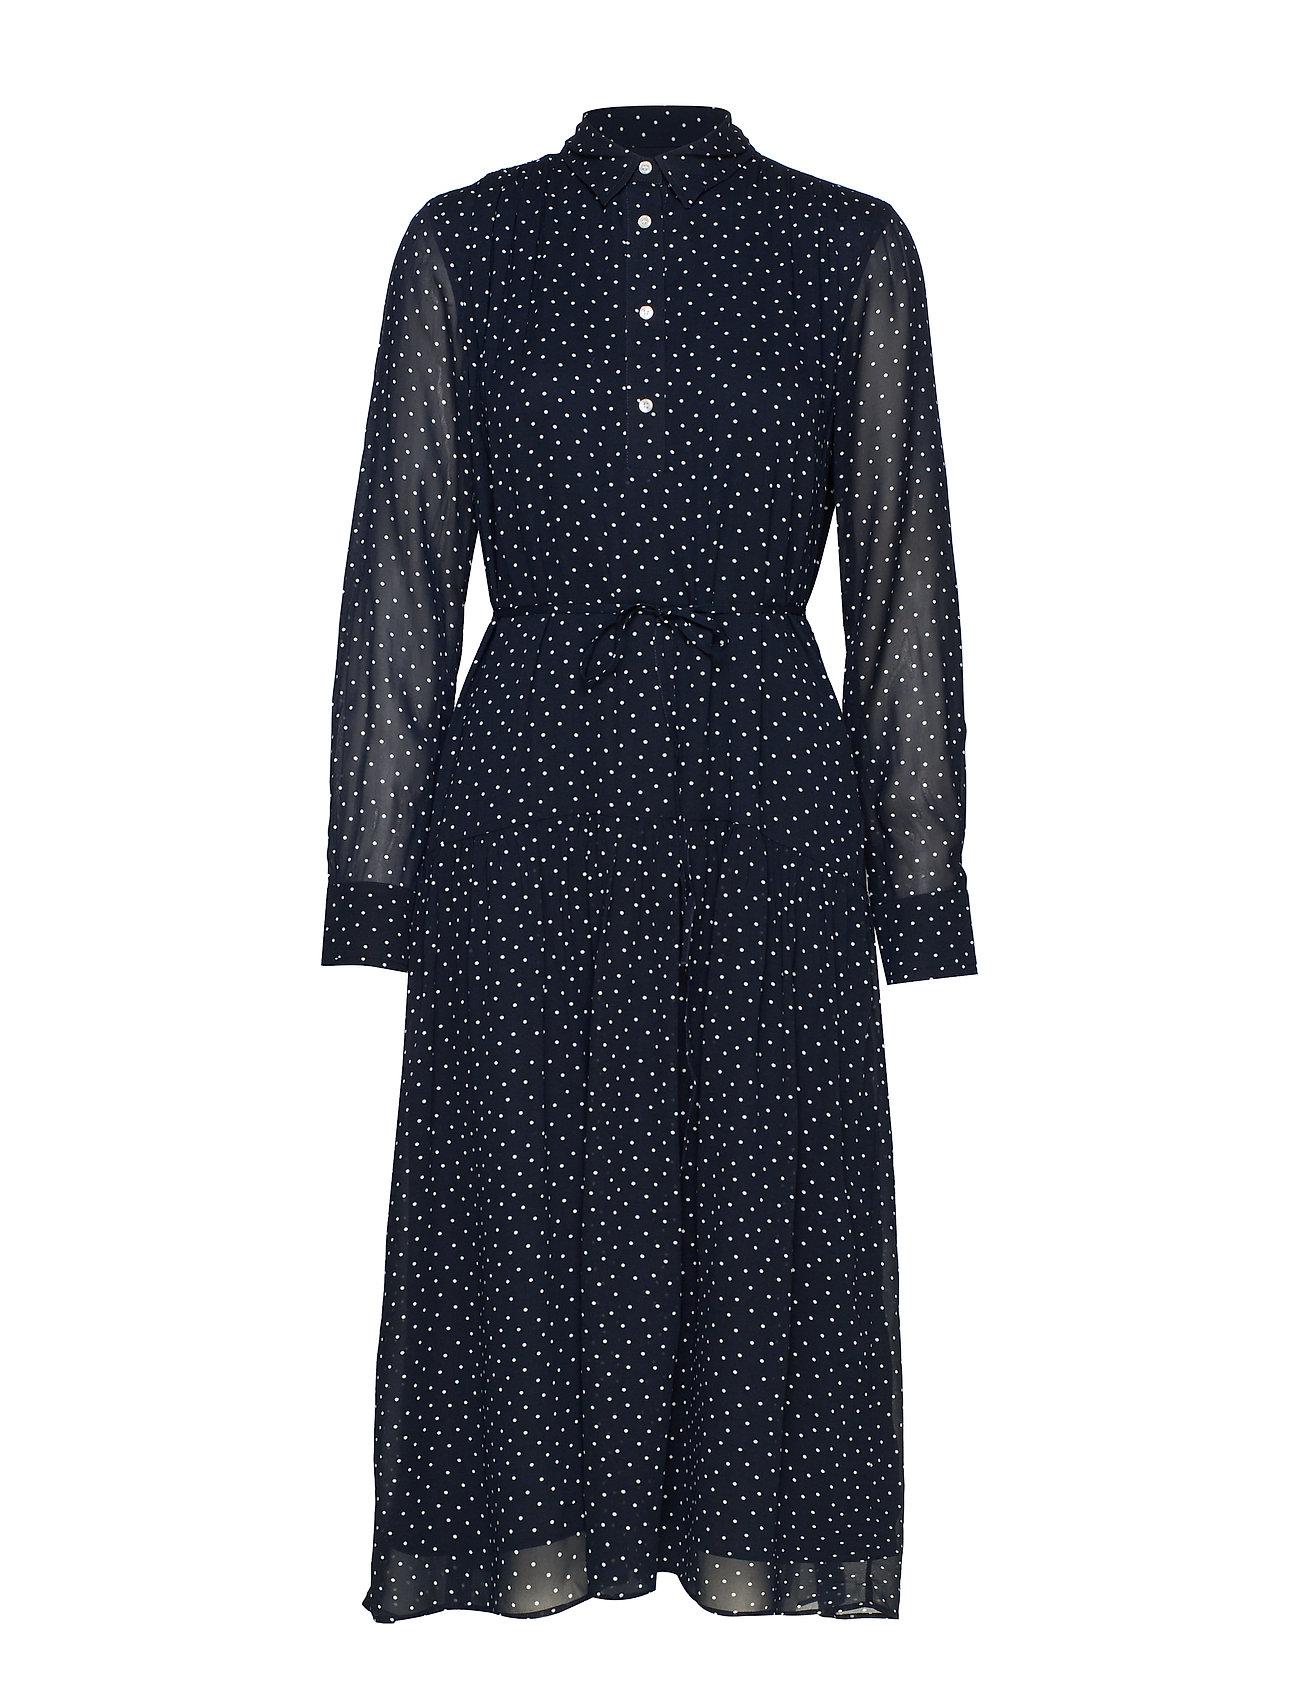 Gant D1. FRENCH DOT CHIFFON DRESS - EVENING BLUE